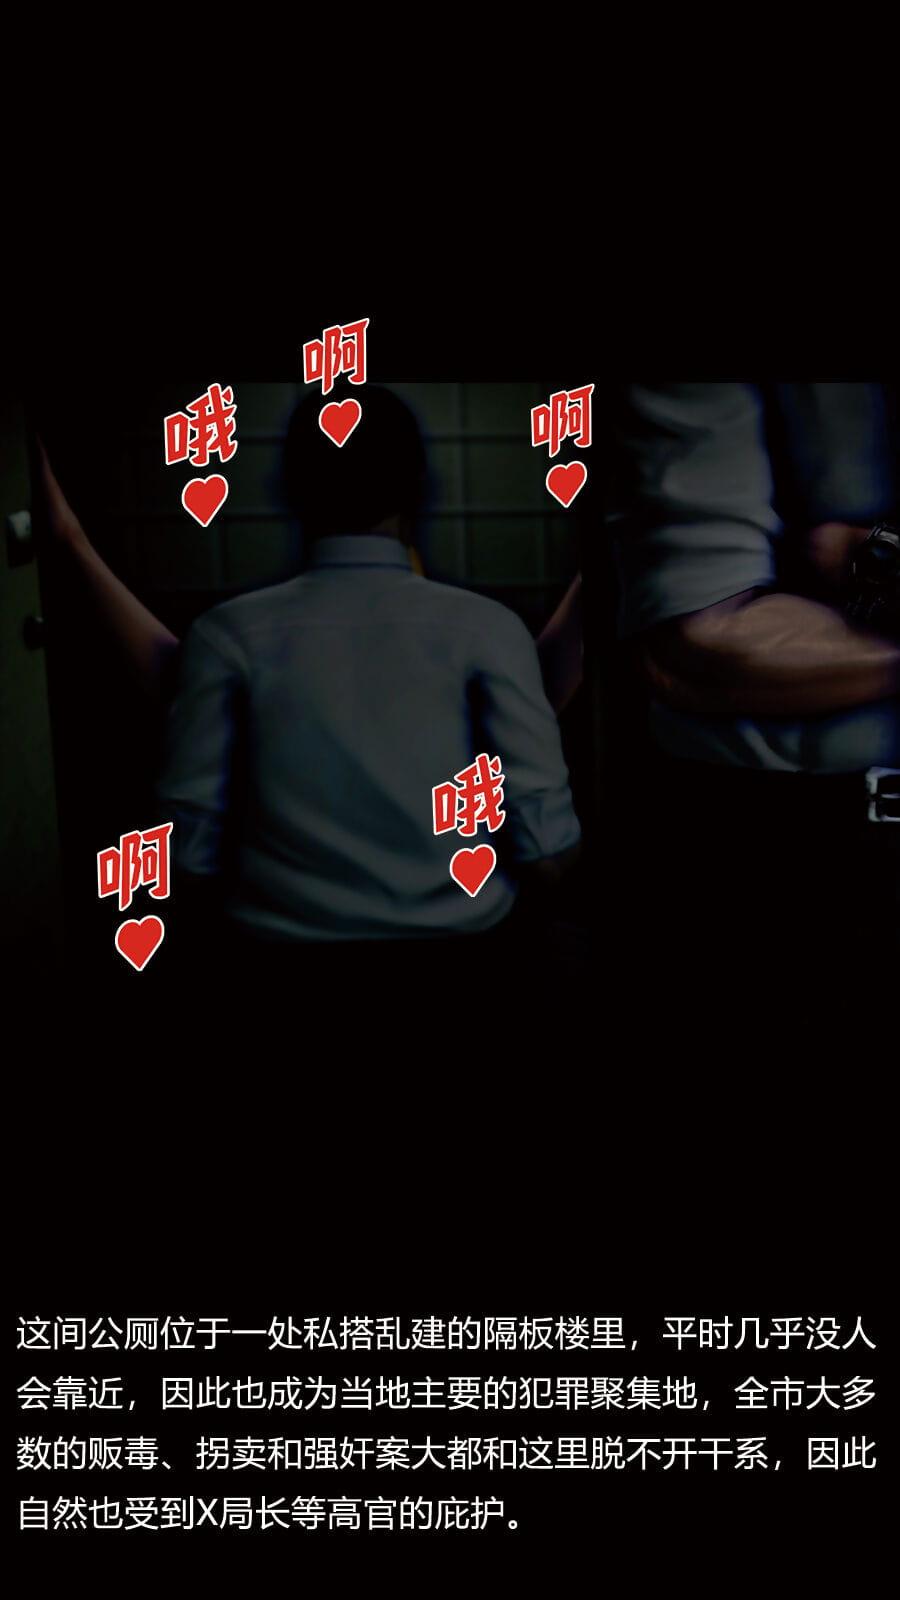 HornCriminal Net暗网淫欲都市R1- Accoutrement 4 - 张倩篇 - attaching 4